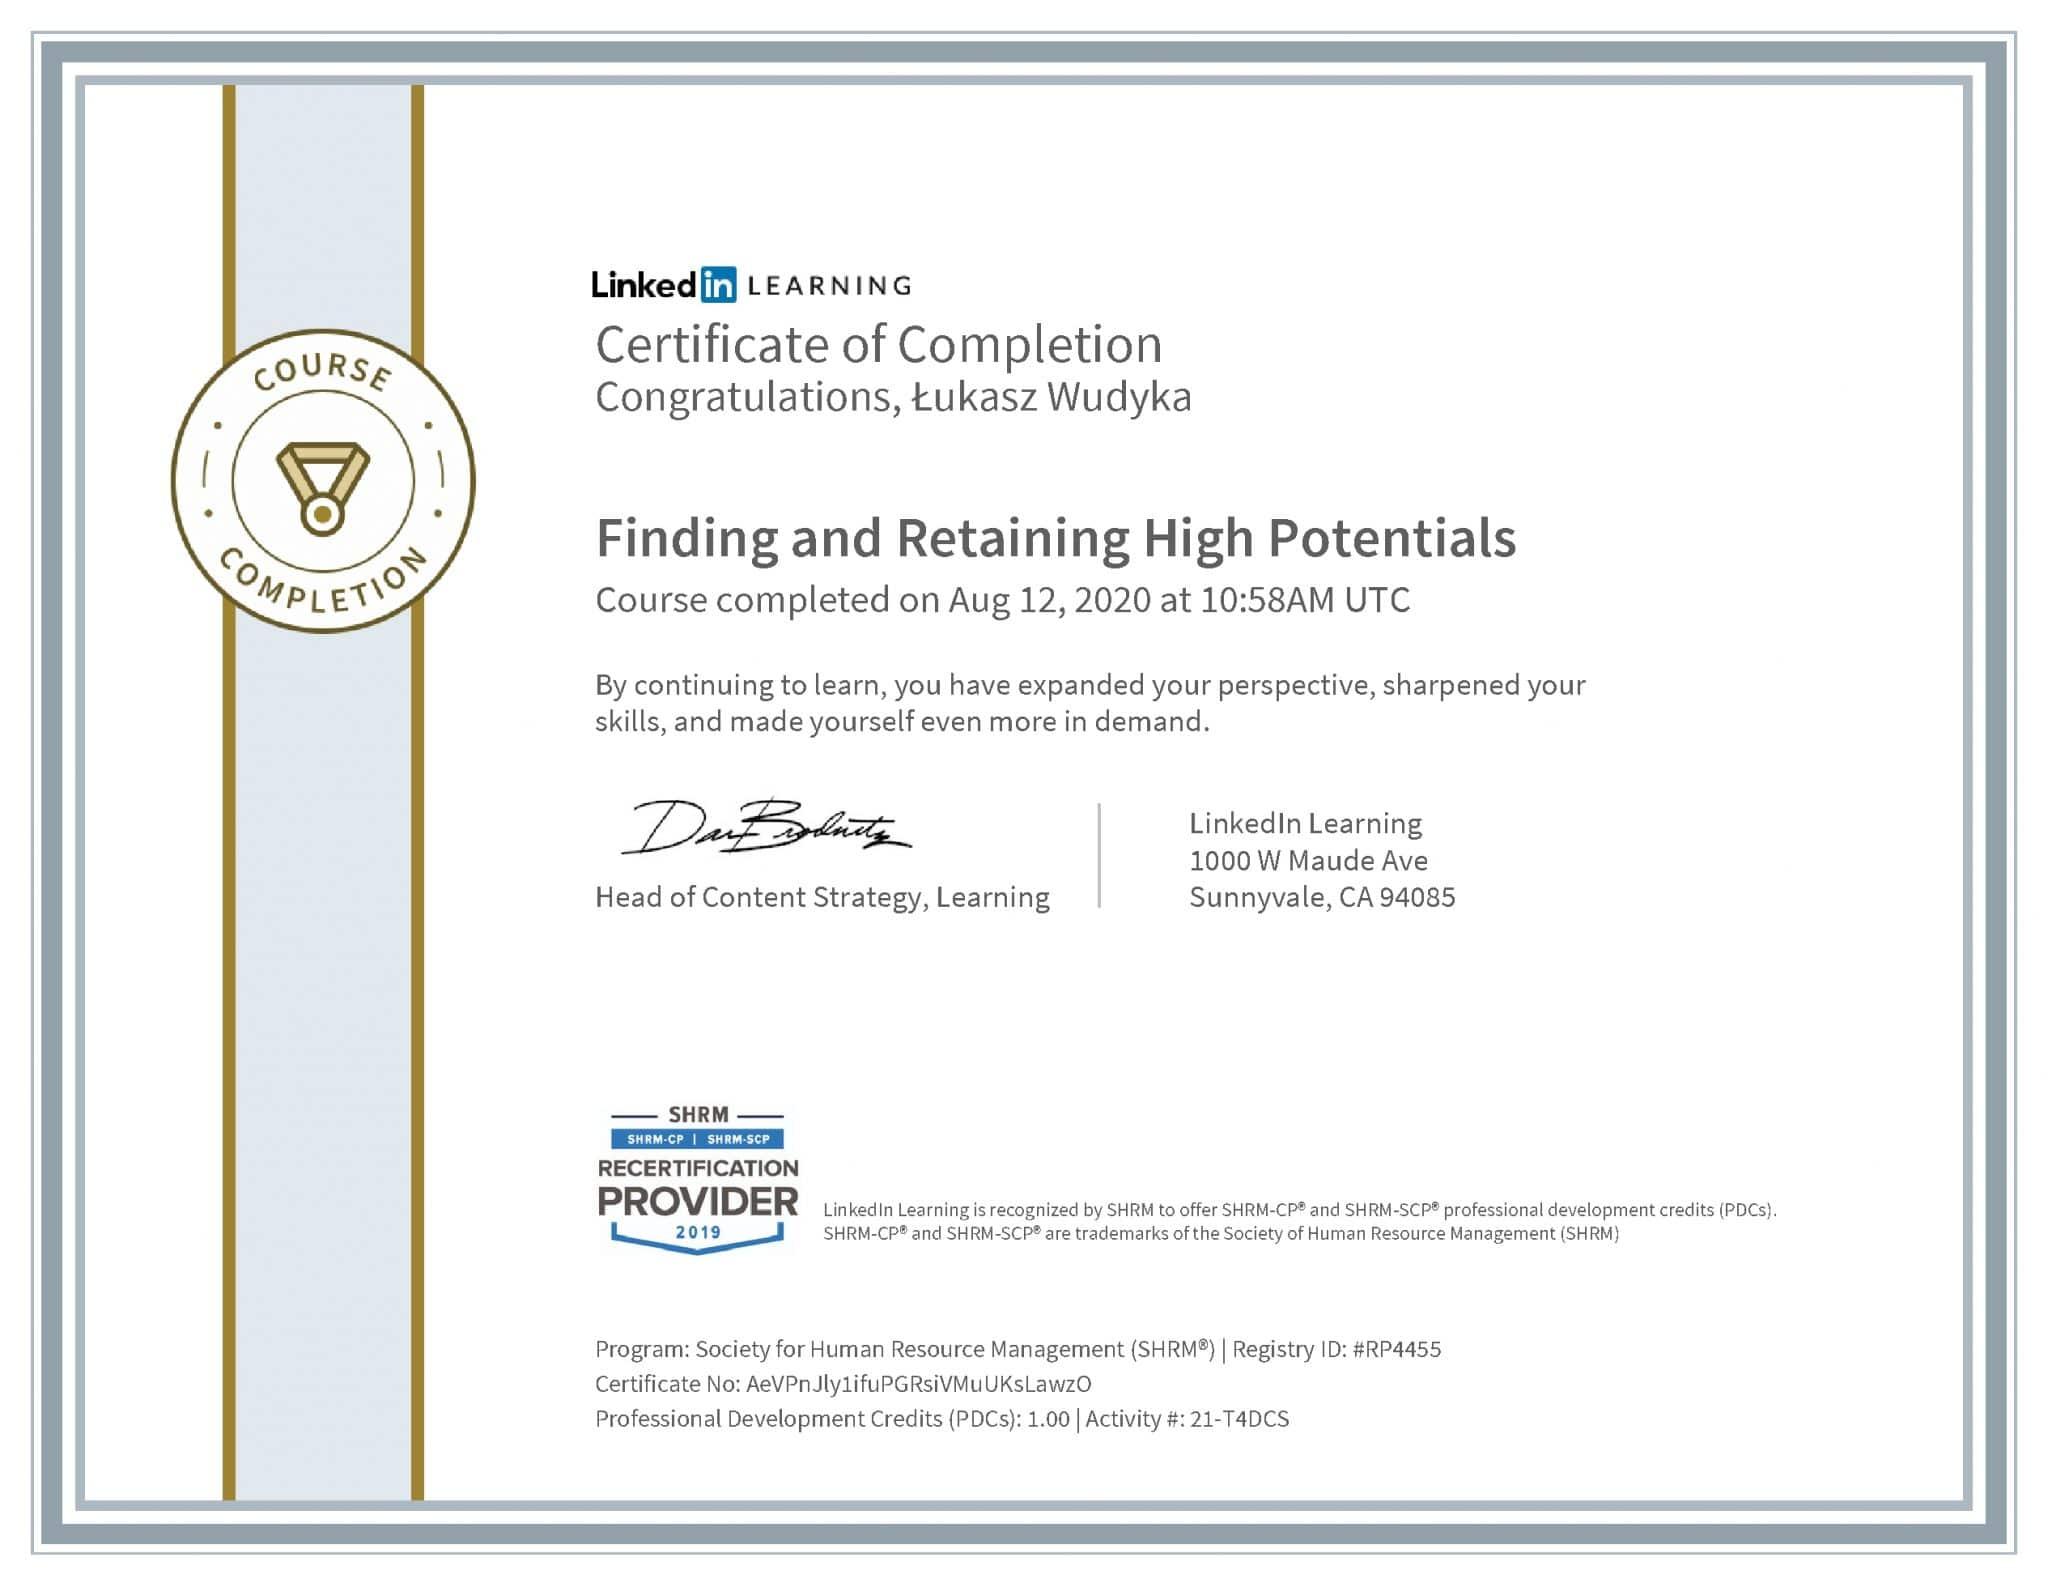 Łukasz Wudyka certyfikat LinkedIn Finding and Retaining High Potentials SHRM